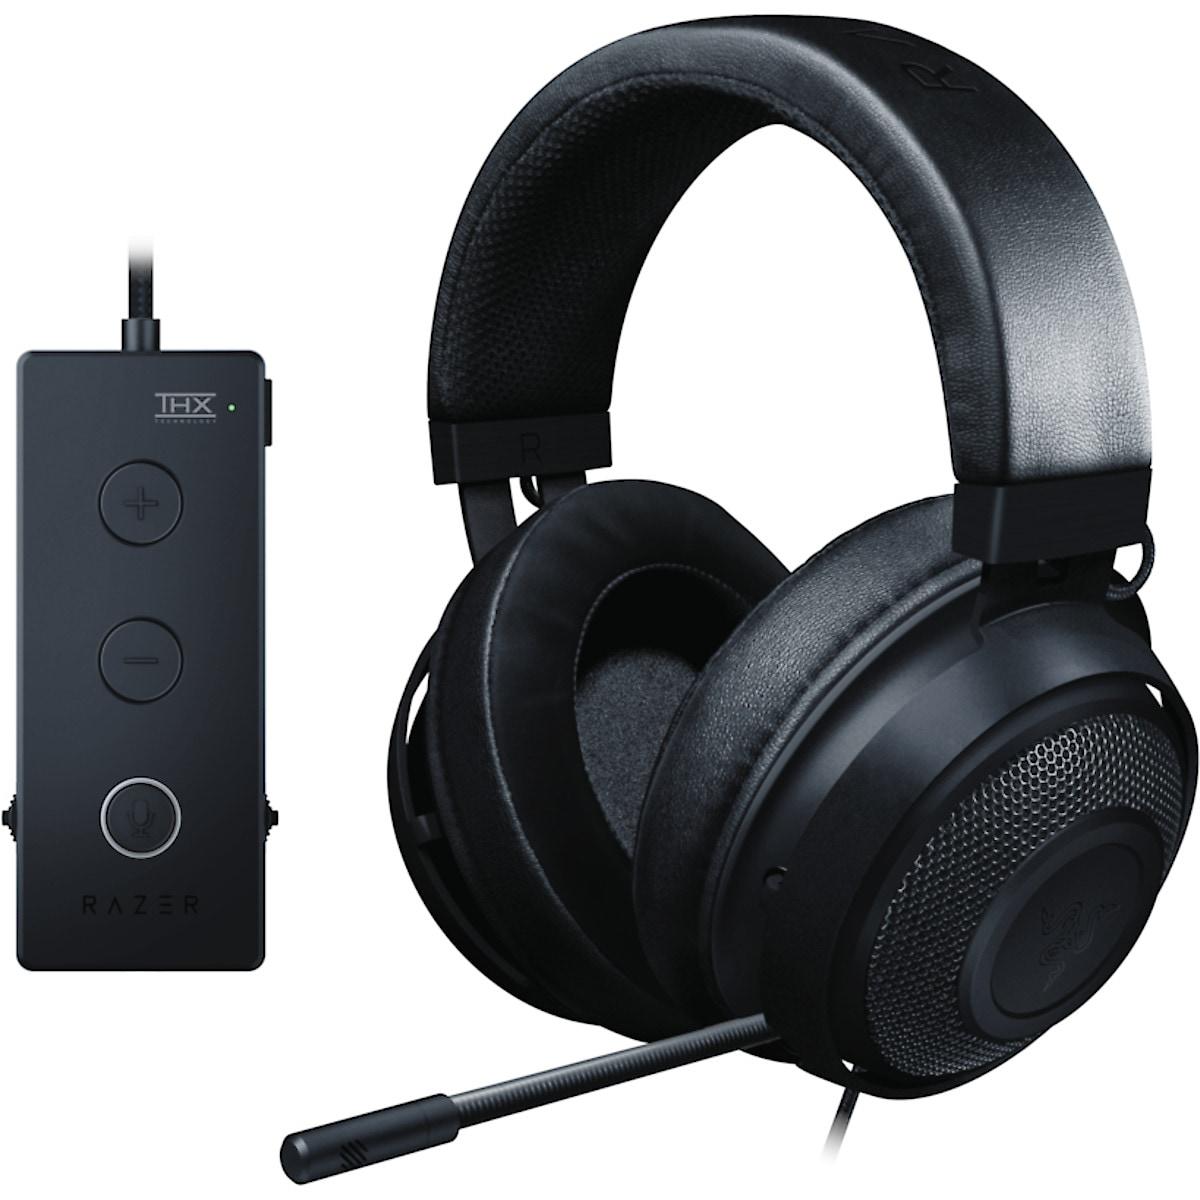 Gaming-headset Razer Kraken Tournament Black Edition